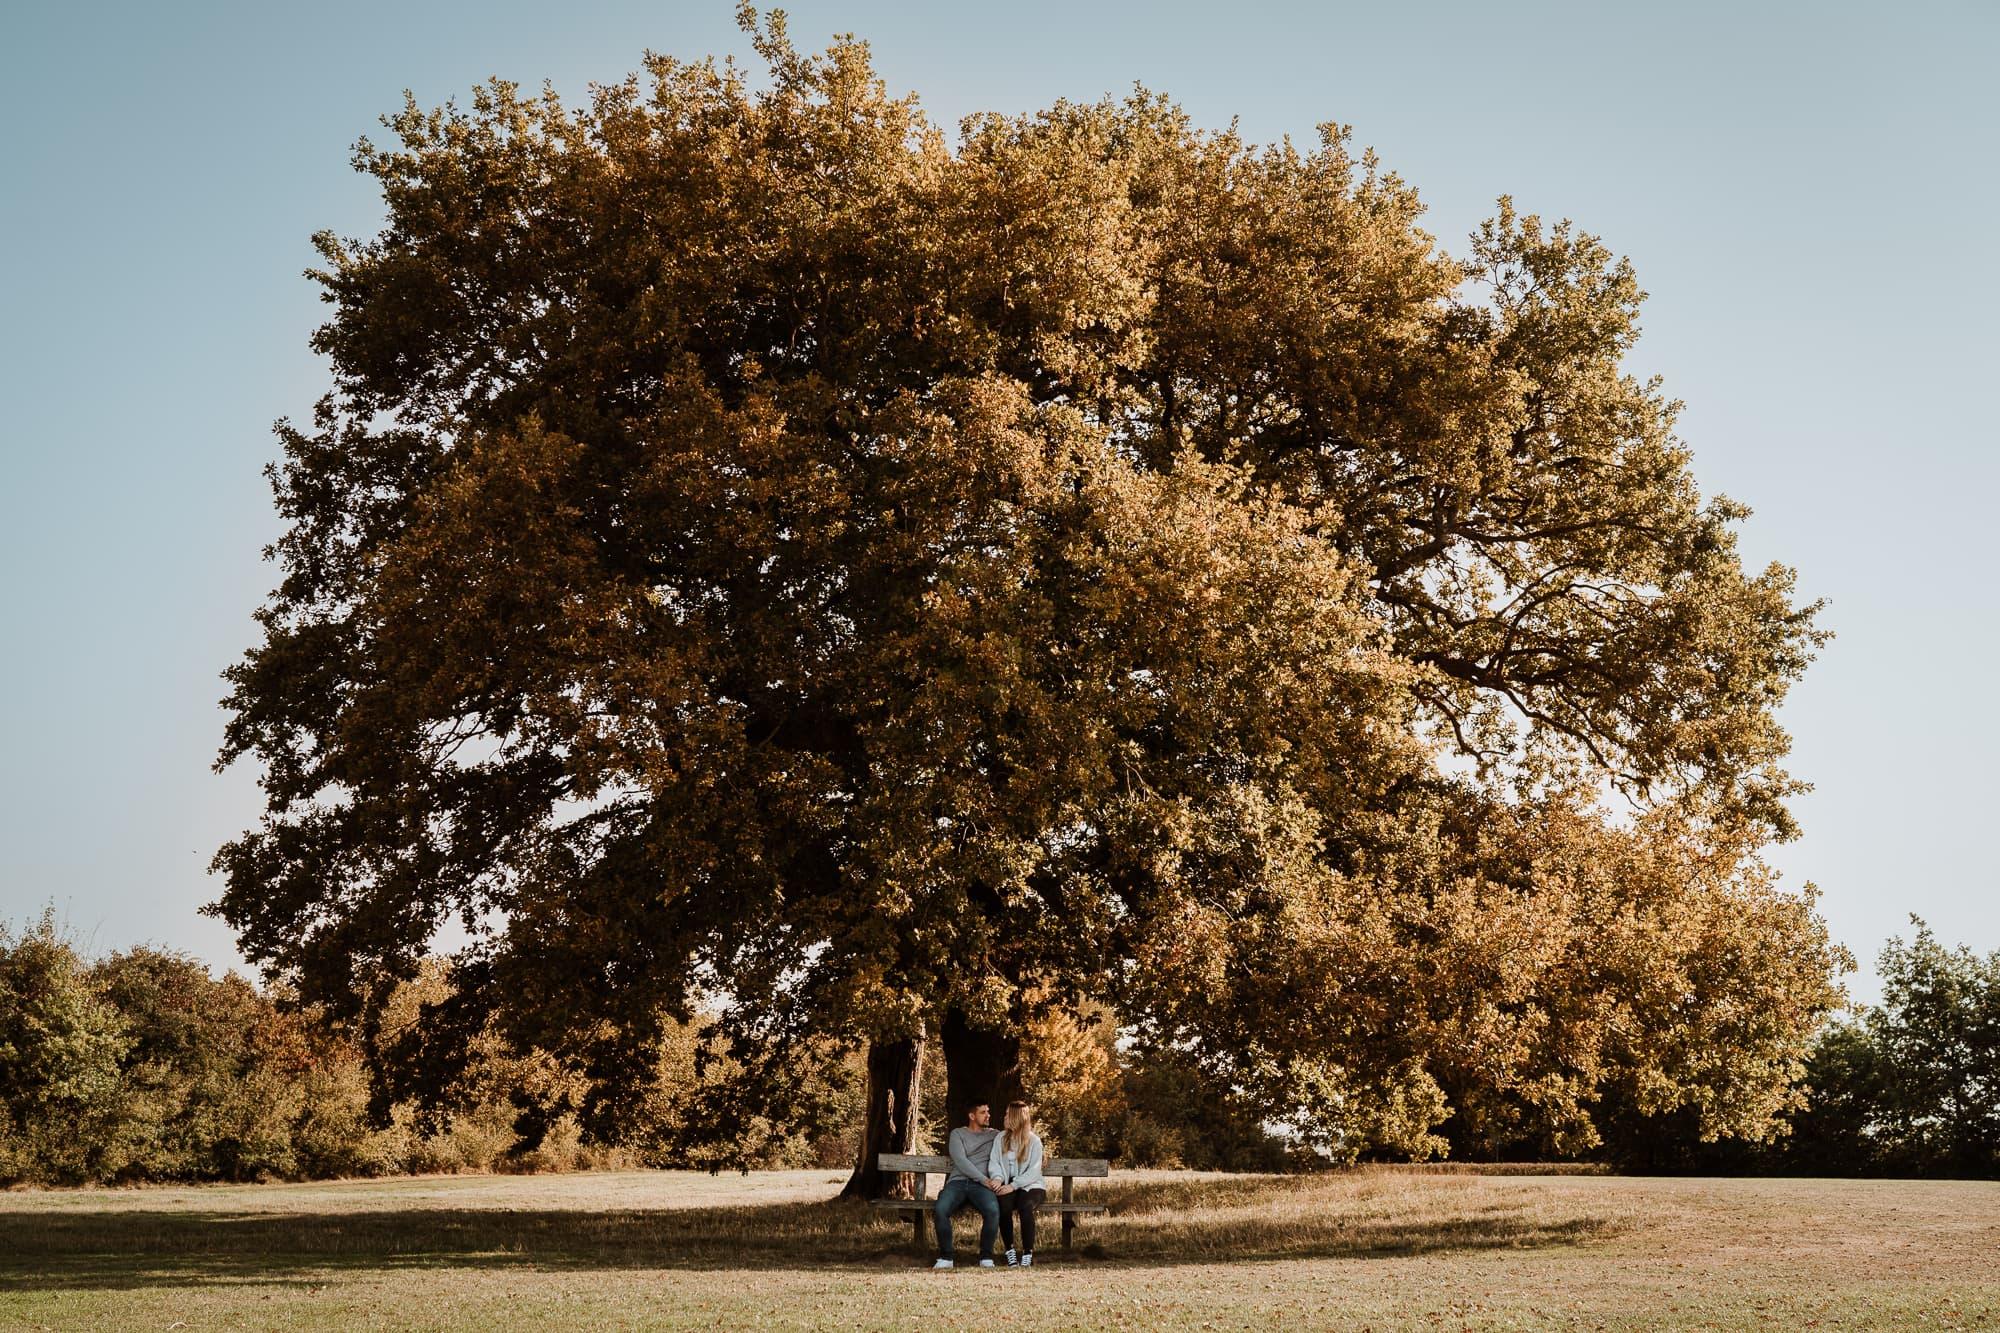 Couple on bench under autumnal tree